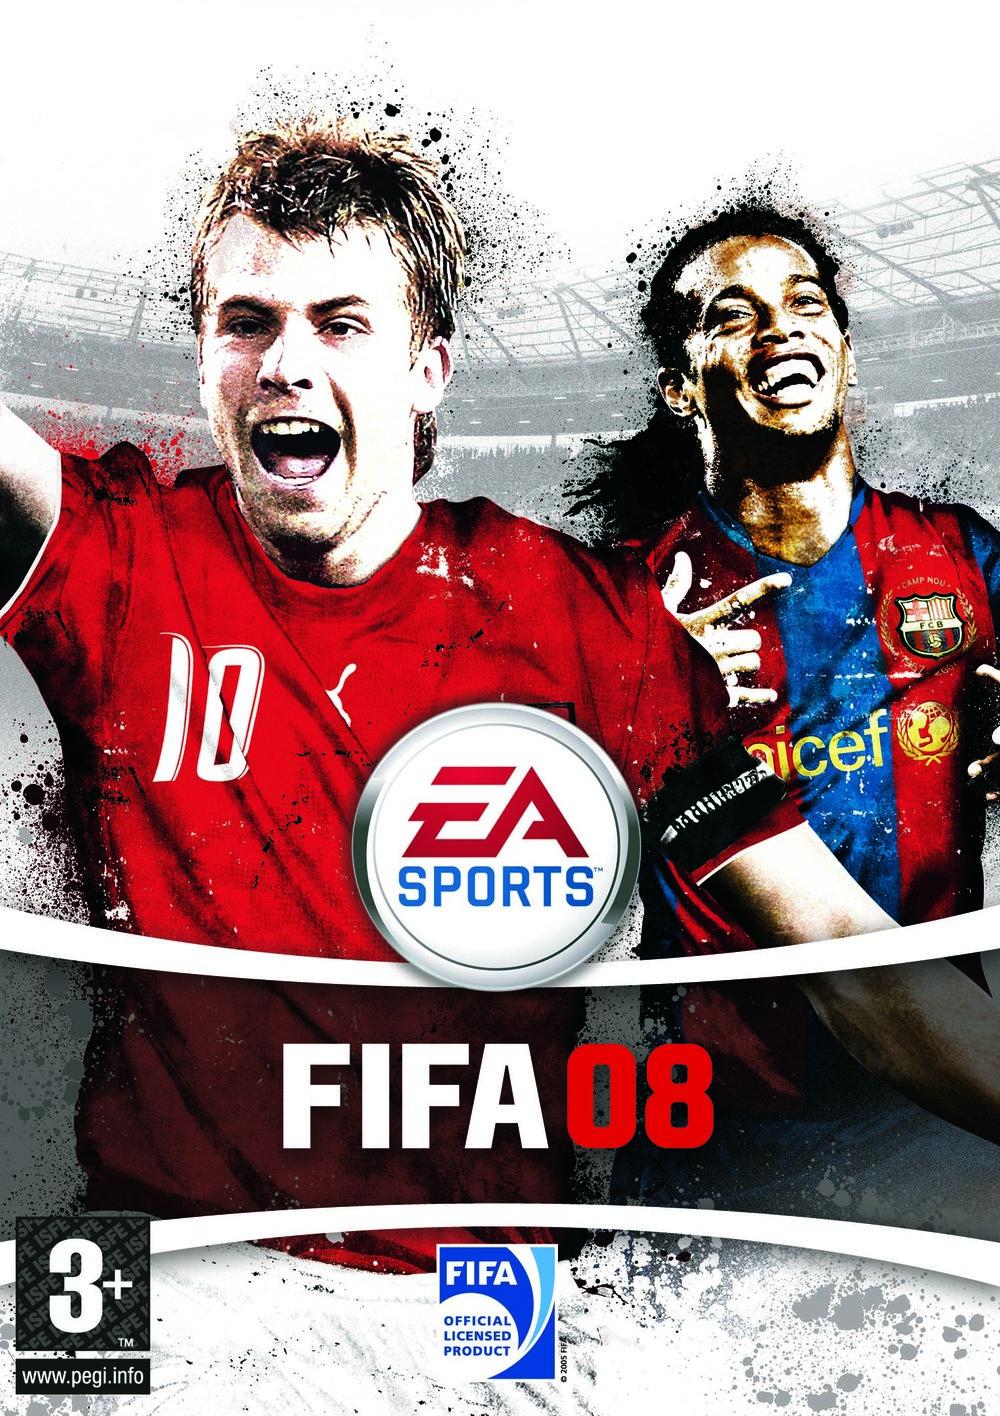 FIFA08genPFTau.jpg